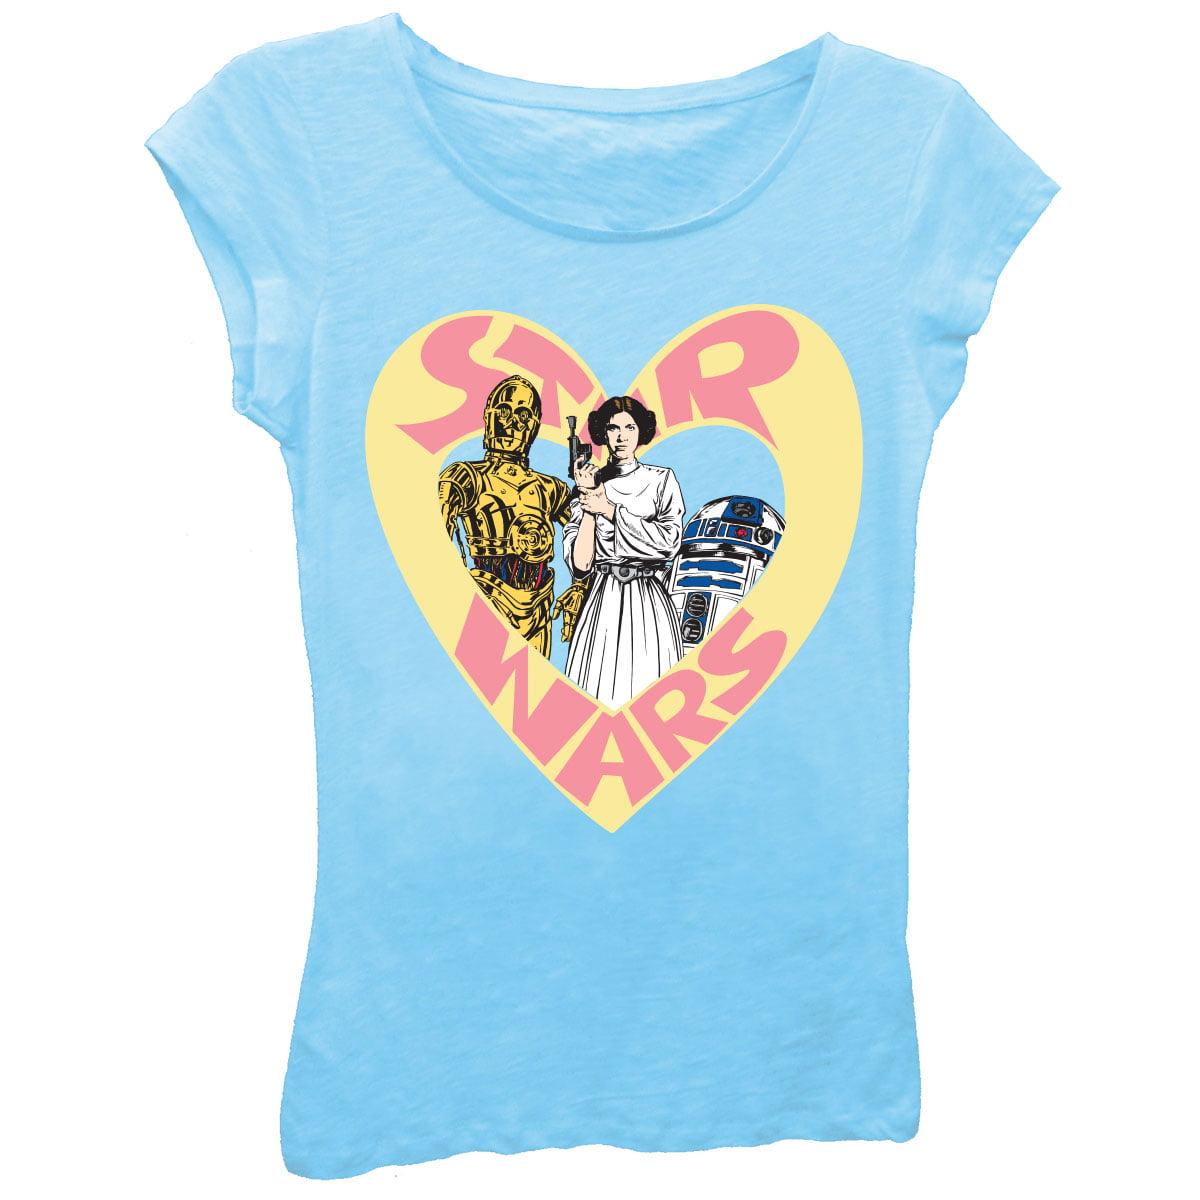 Girls' Short Sleeve Graphic T-shirt